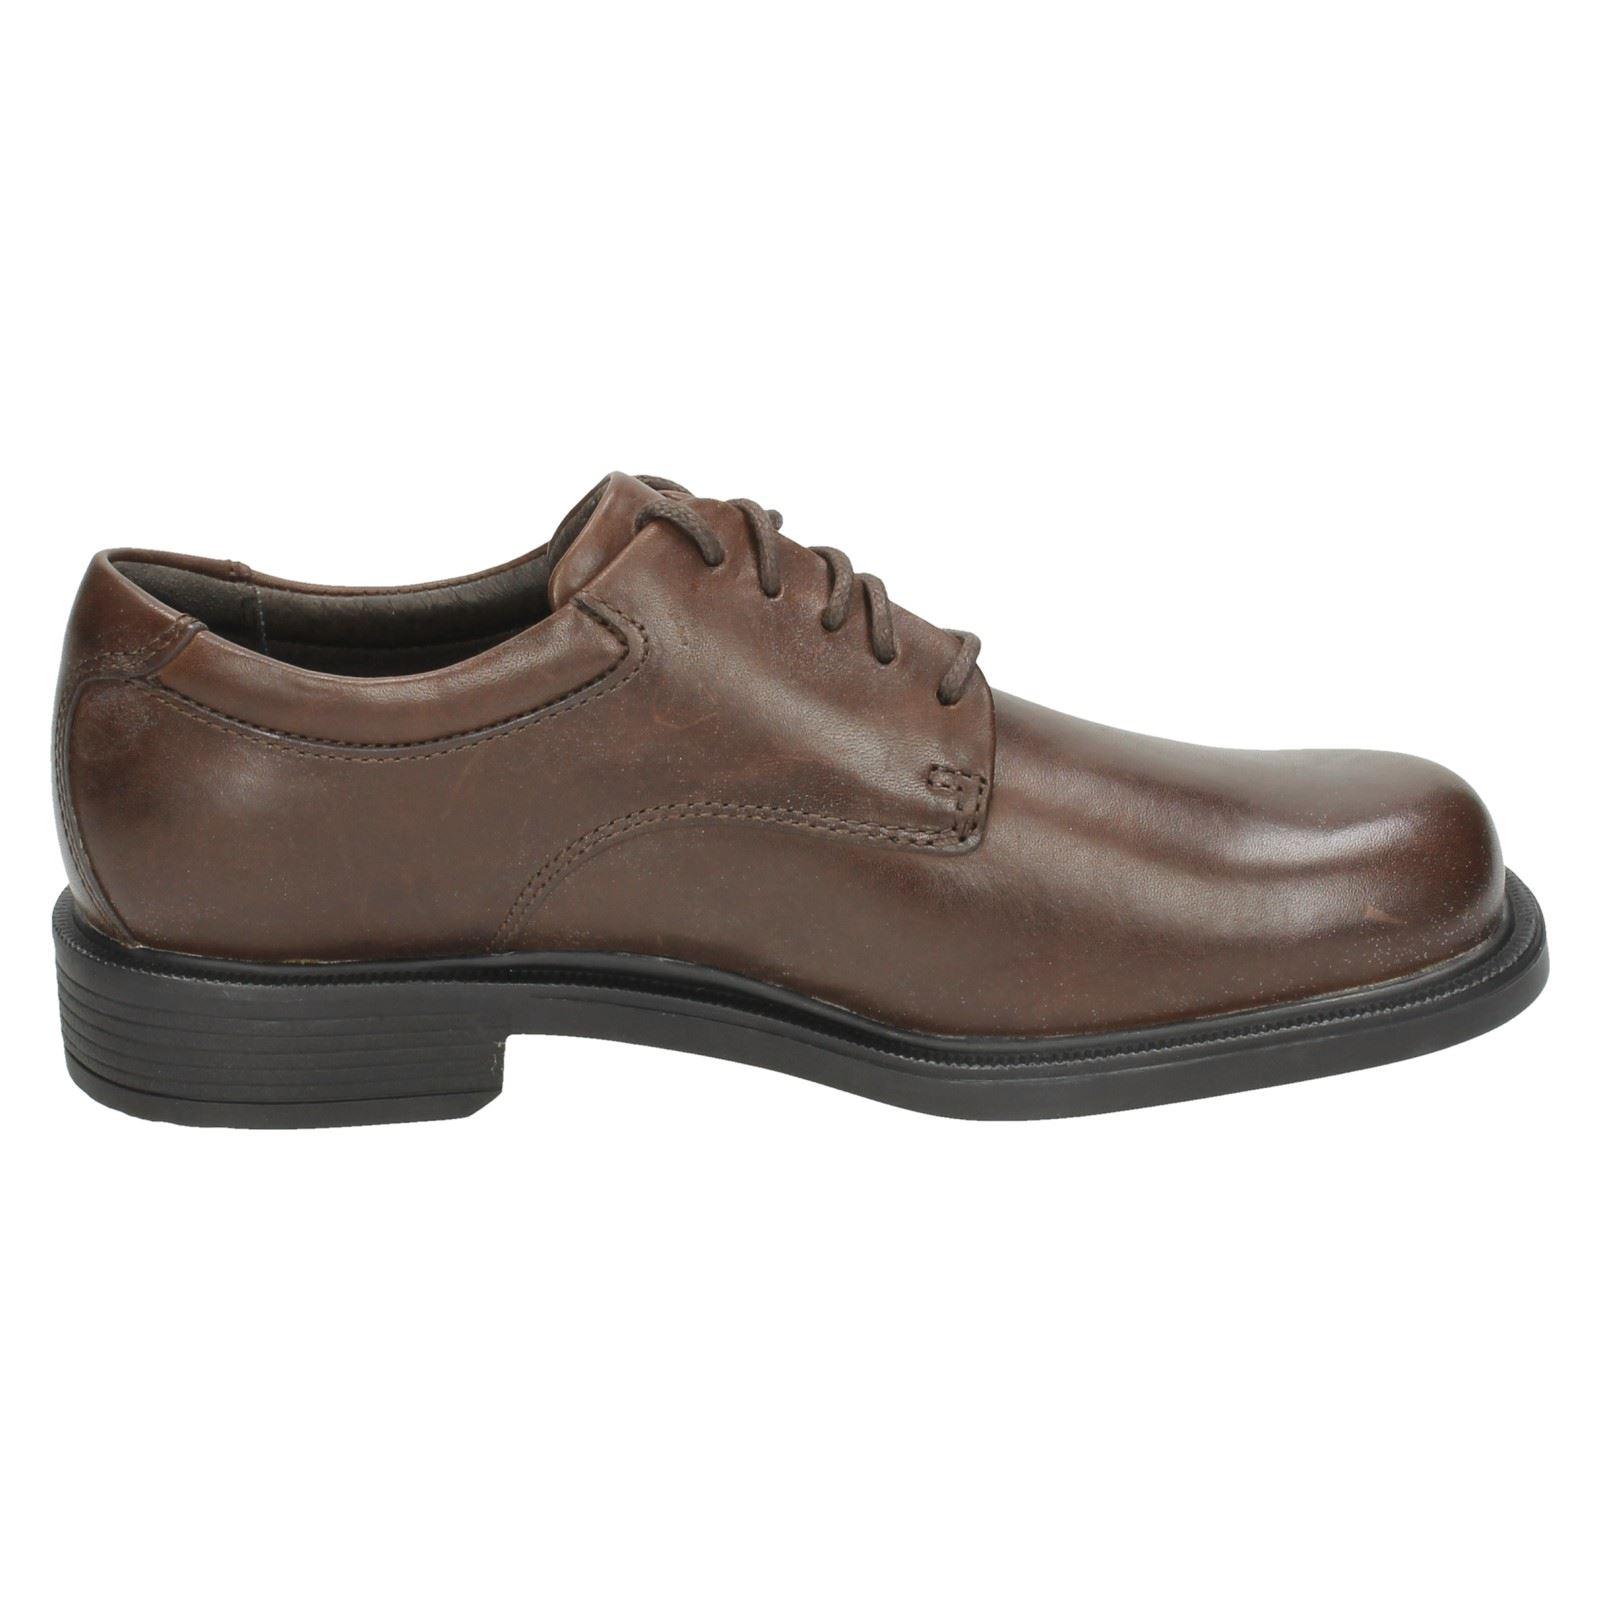 mens rockport casual lace up shoes apm2031c ebay